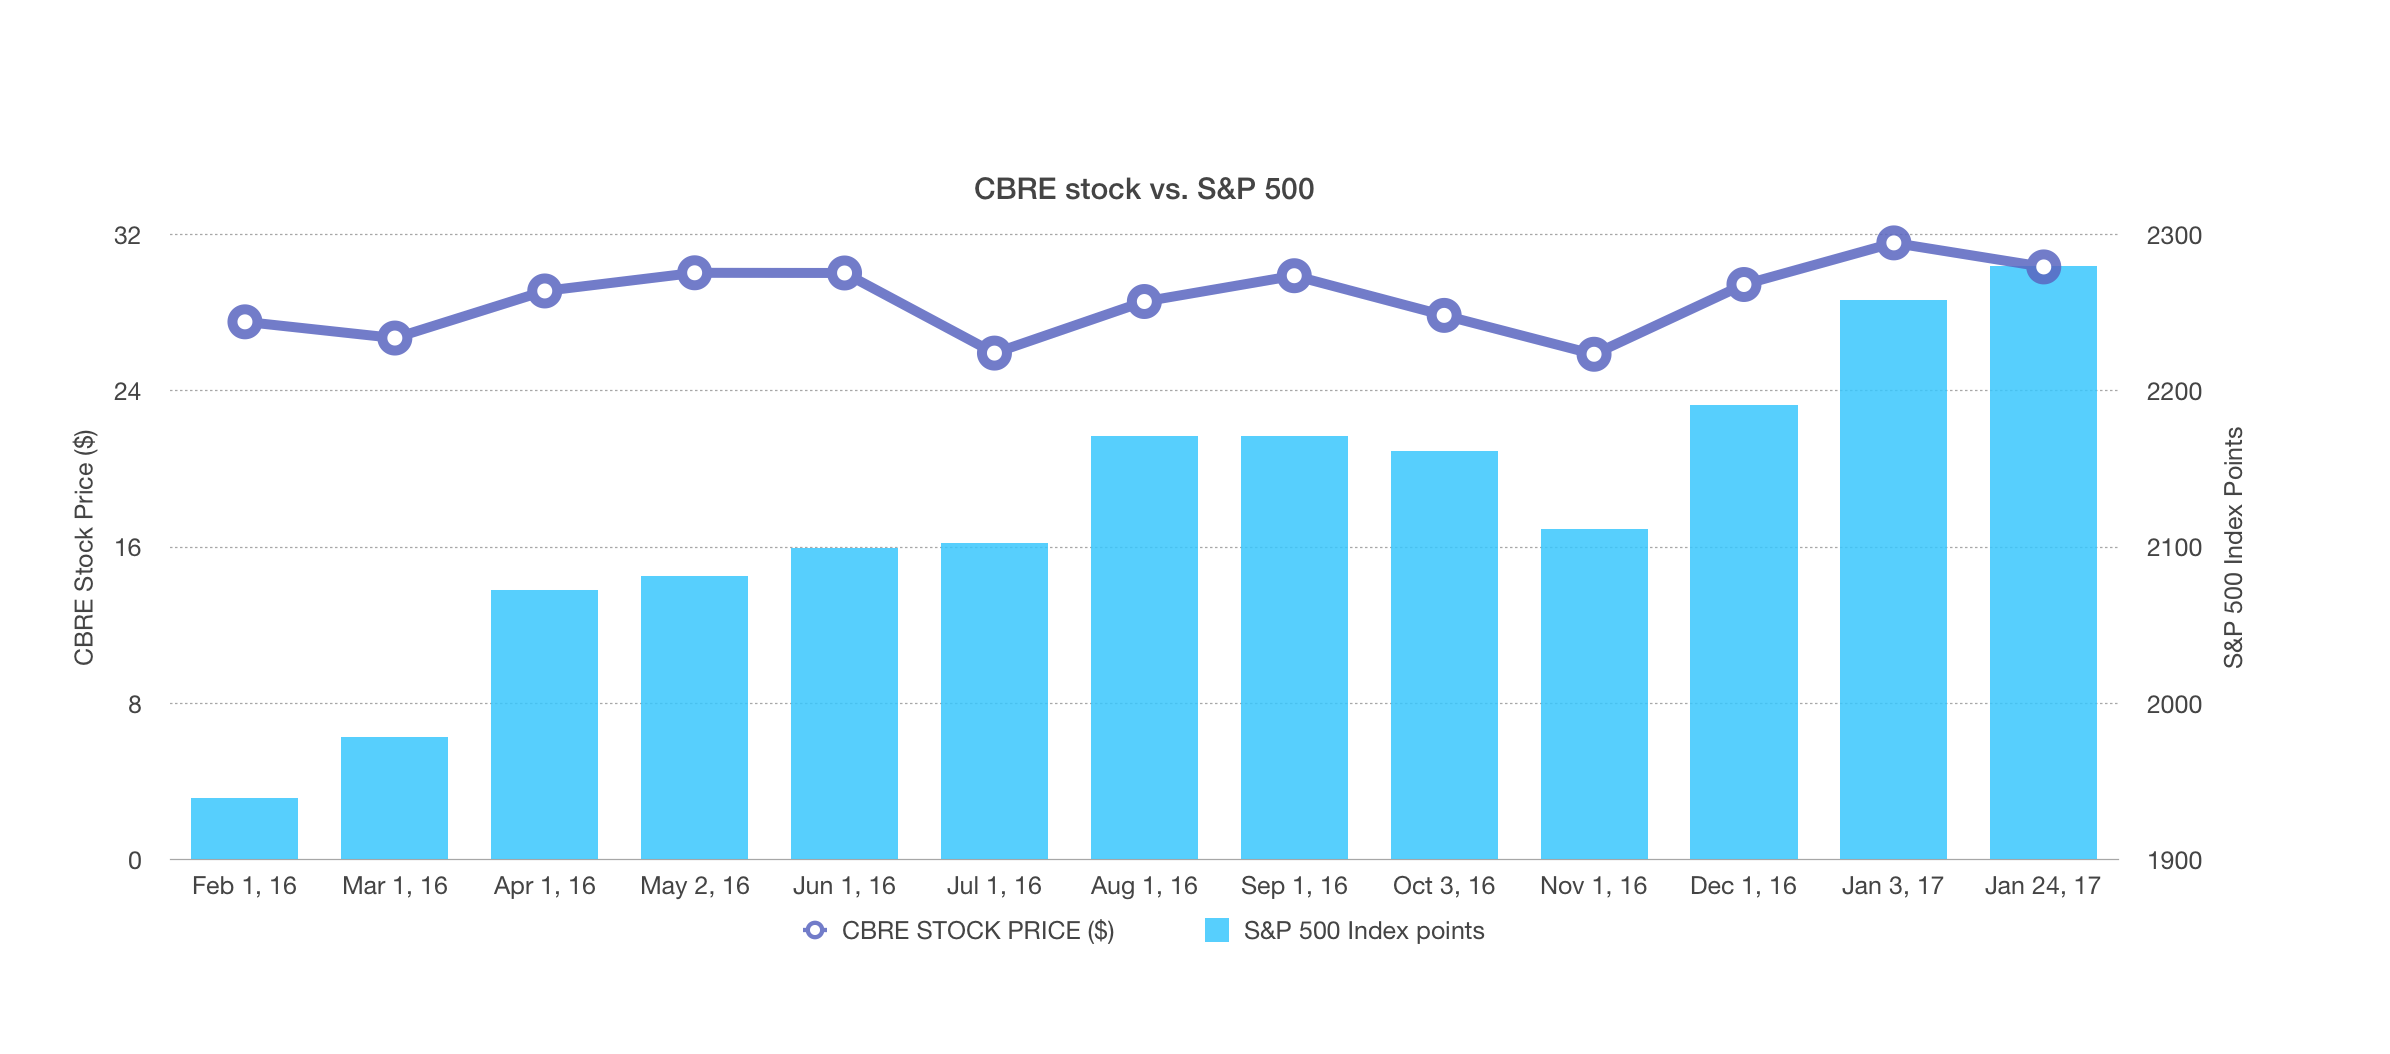 CBRE stock vs S&P 500